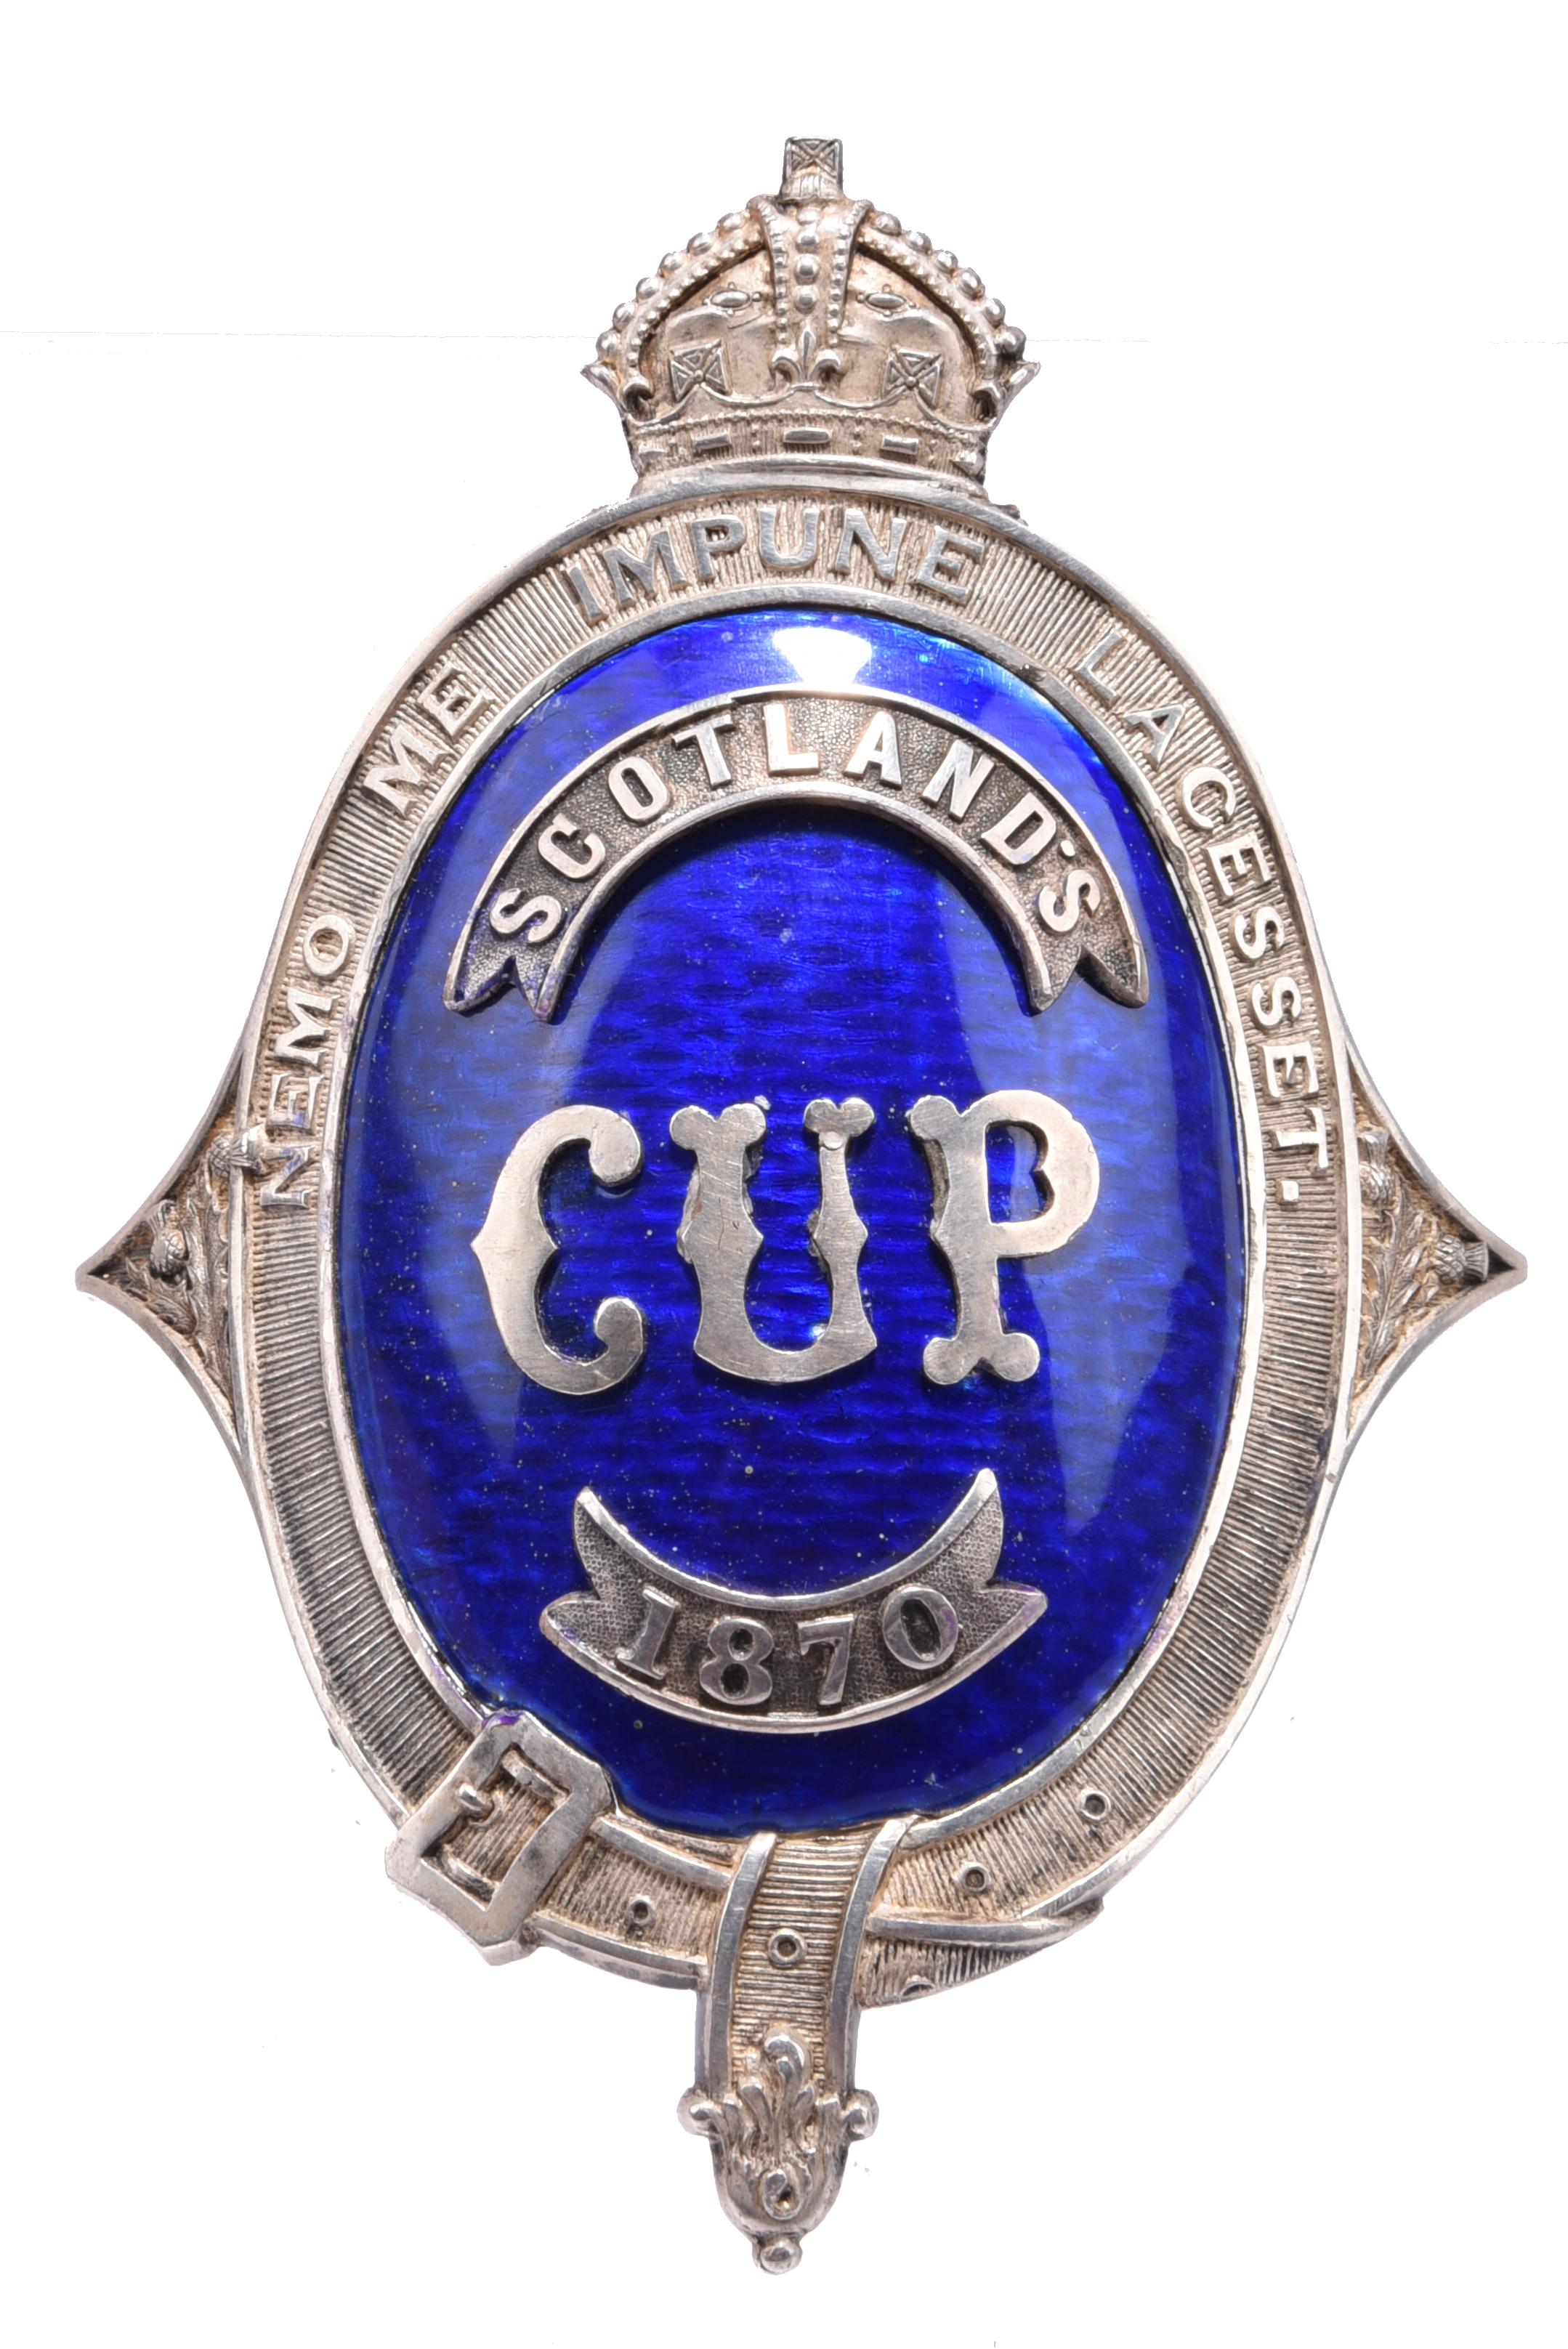 Forfar Artillery Volunteers/Royal HighlandShow: Scotland's Cup 1870, a silver and enamel brooch,